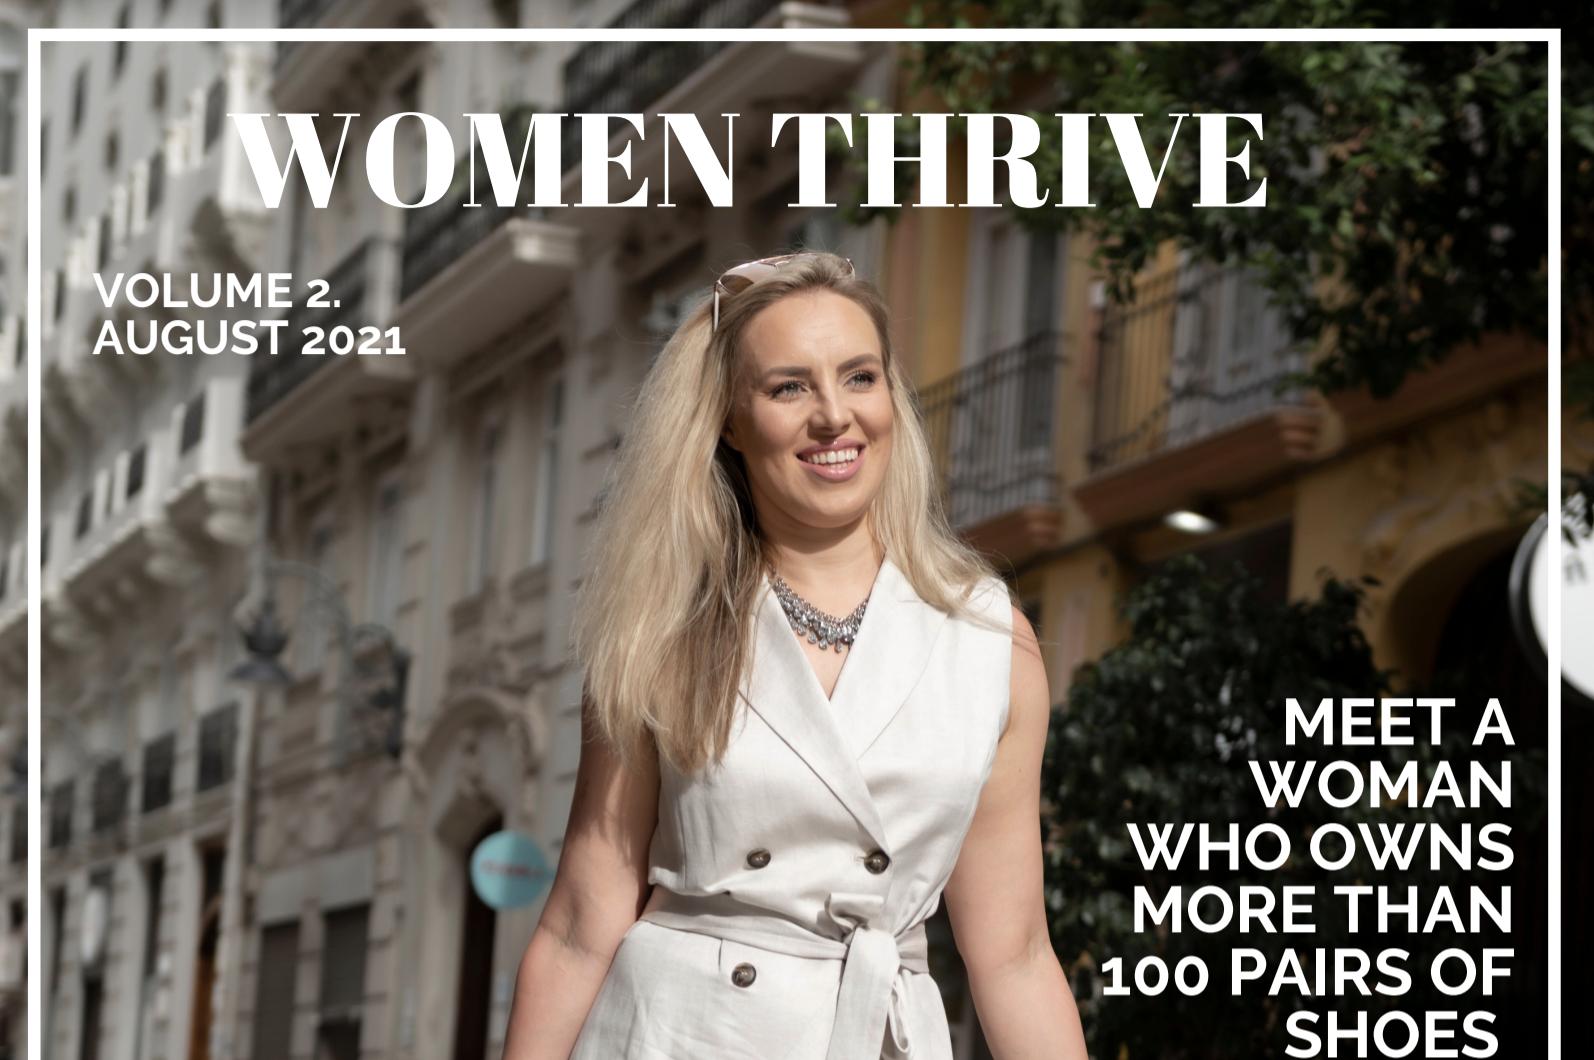 Join successful women entrepreneurs network